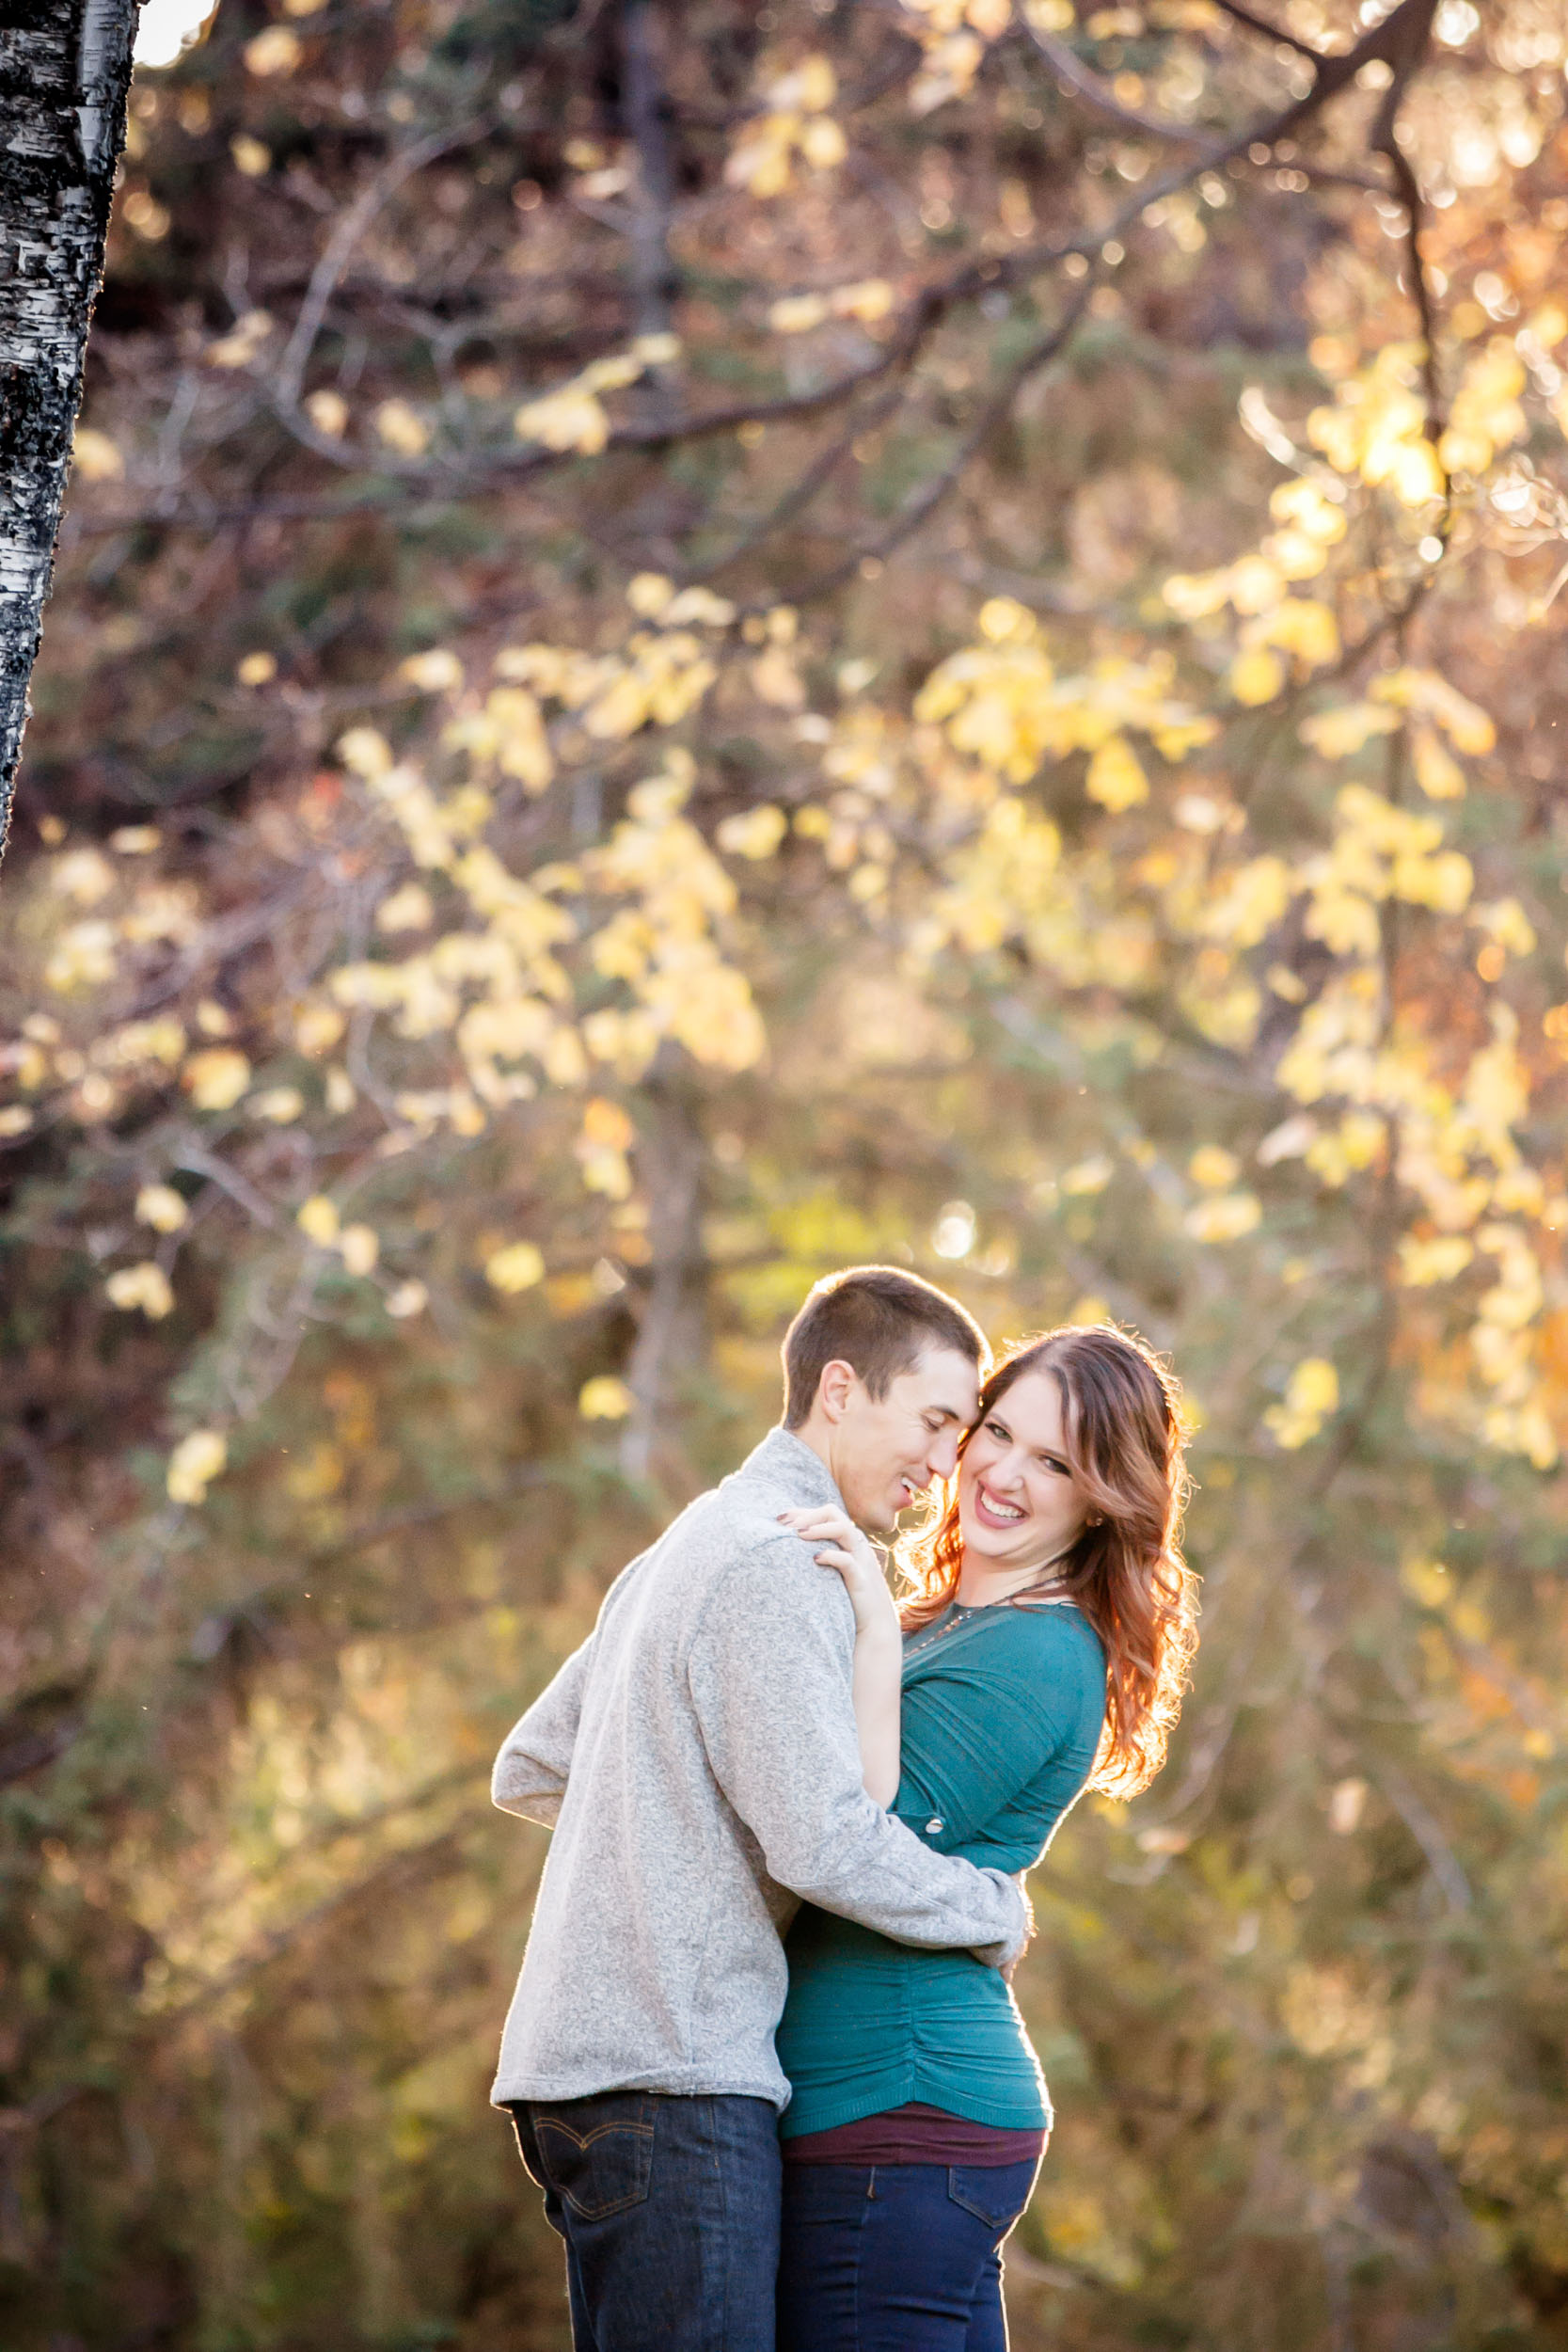 fall-engagement-photos-riverside-park-neenah-wisconsin--adam-shea-photography-green-bay-appleton-neenah-photographer-27.jpg